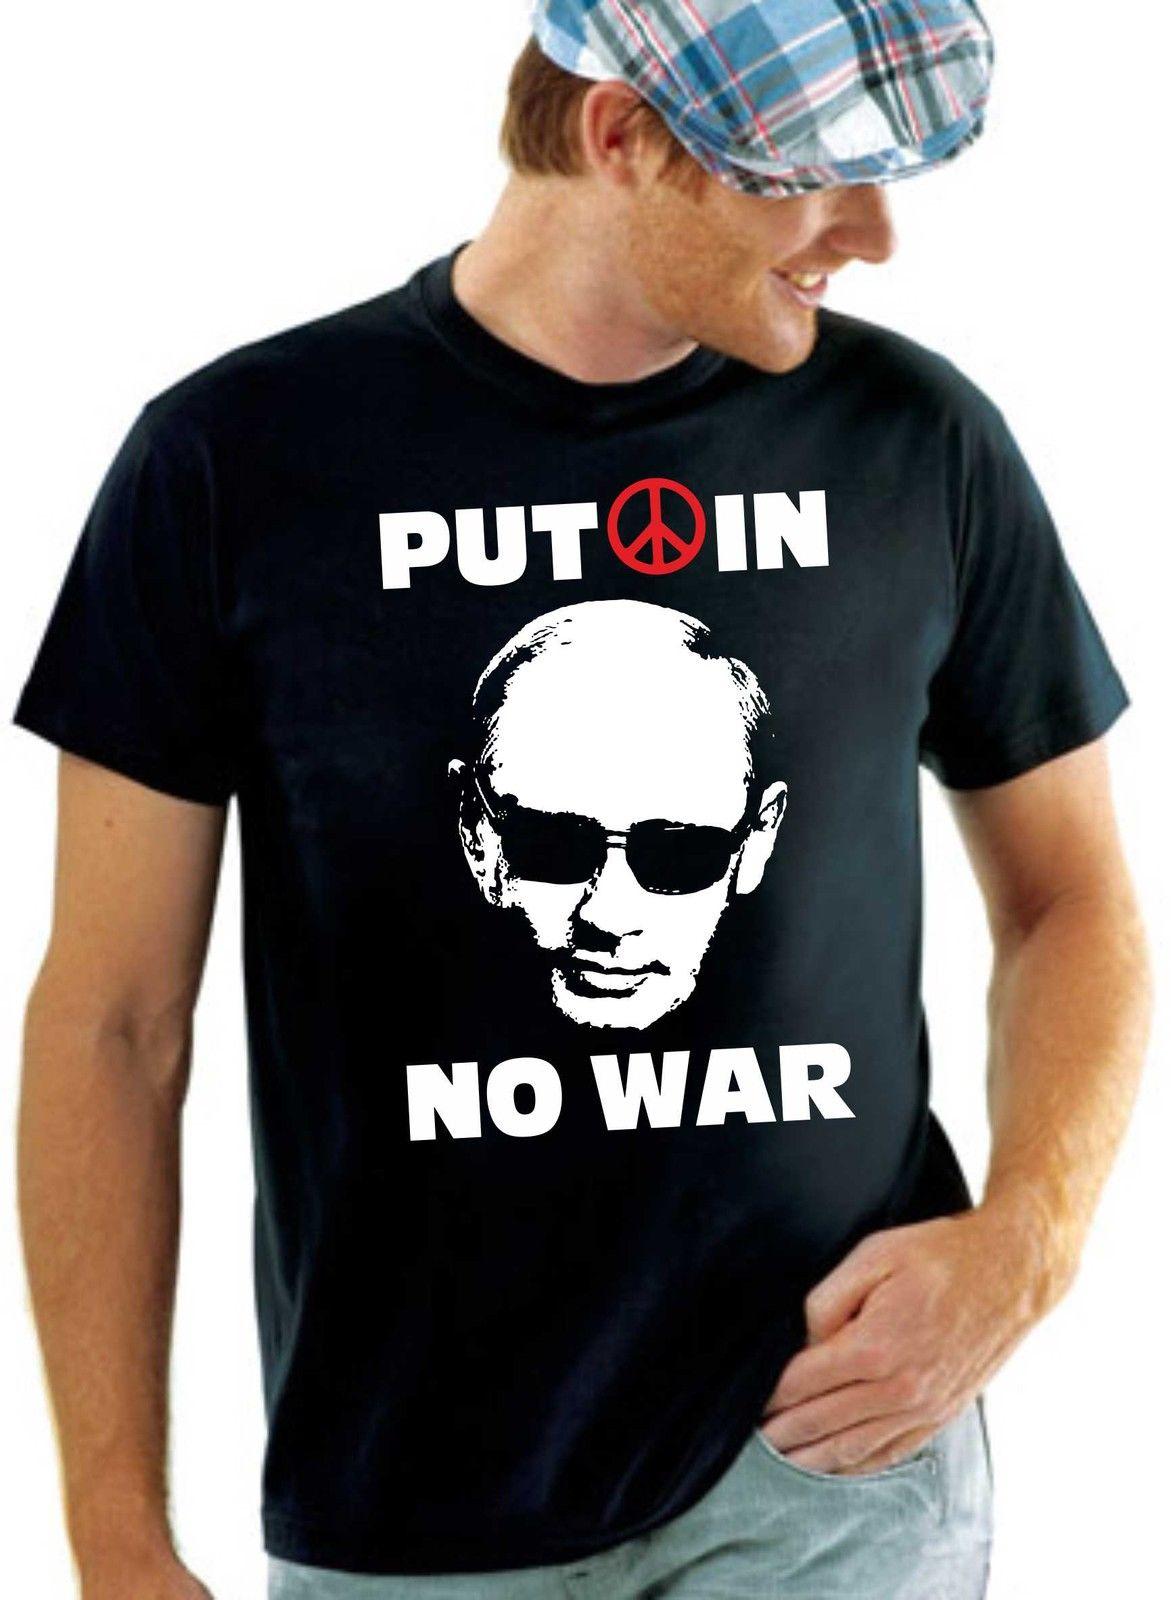 T-Shirt Putin bringe Fieden rédea Krieg nicht Ostermarsch colocar em Anti Fa Átomo